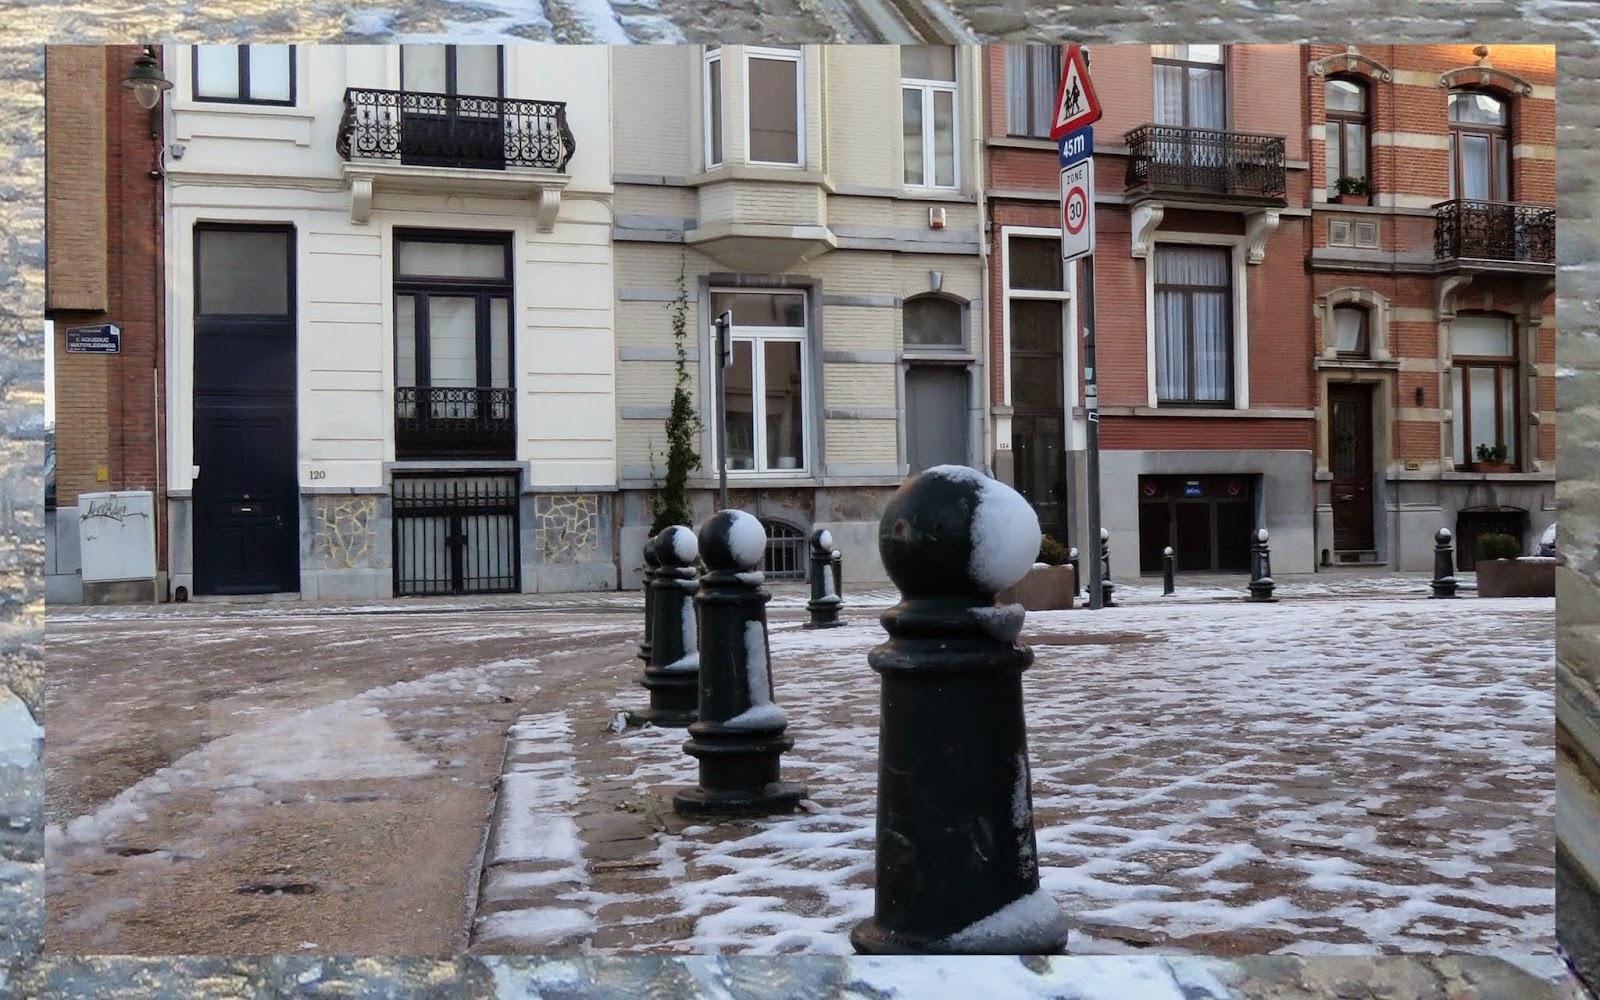 Snowy Residential Street in Brussels